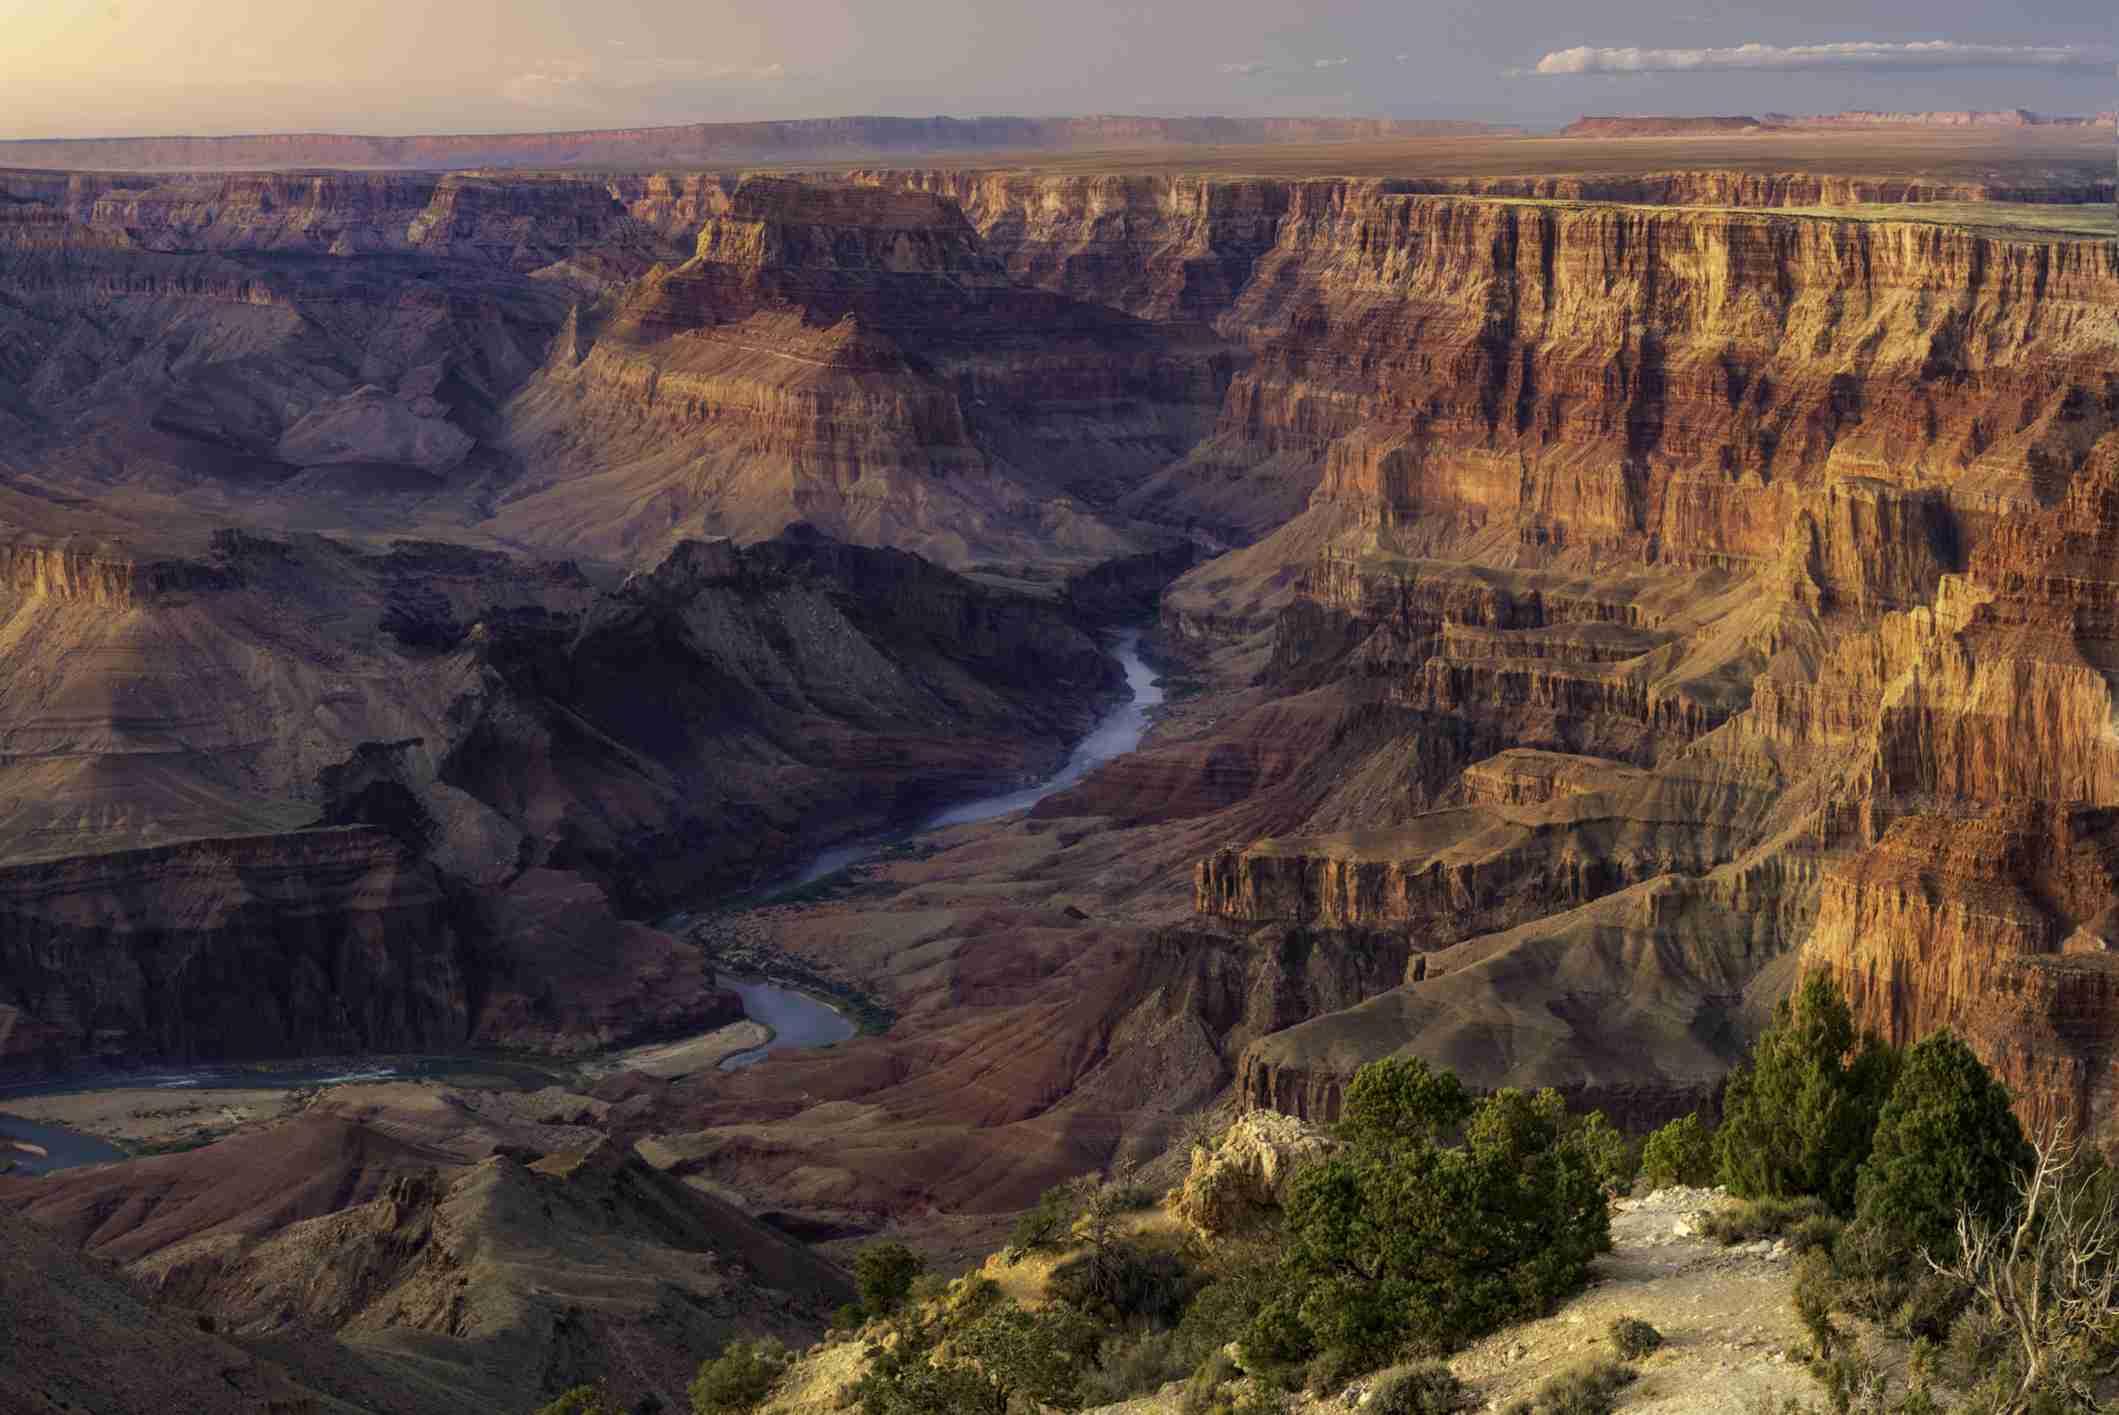 Bunter Sonnenuntergang mit Blick auf den Colorado River tief im Grand Canyon